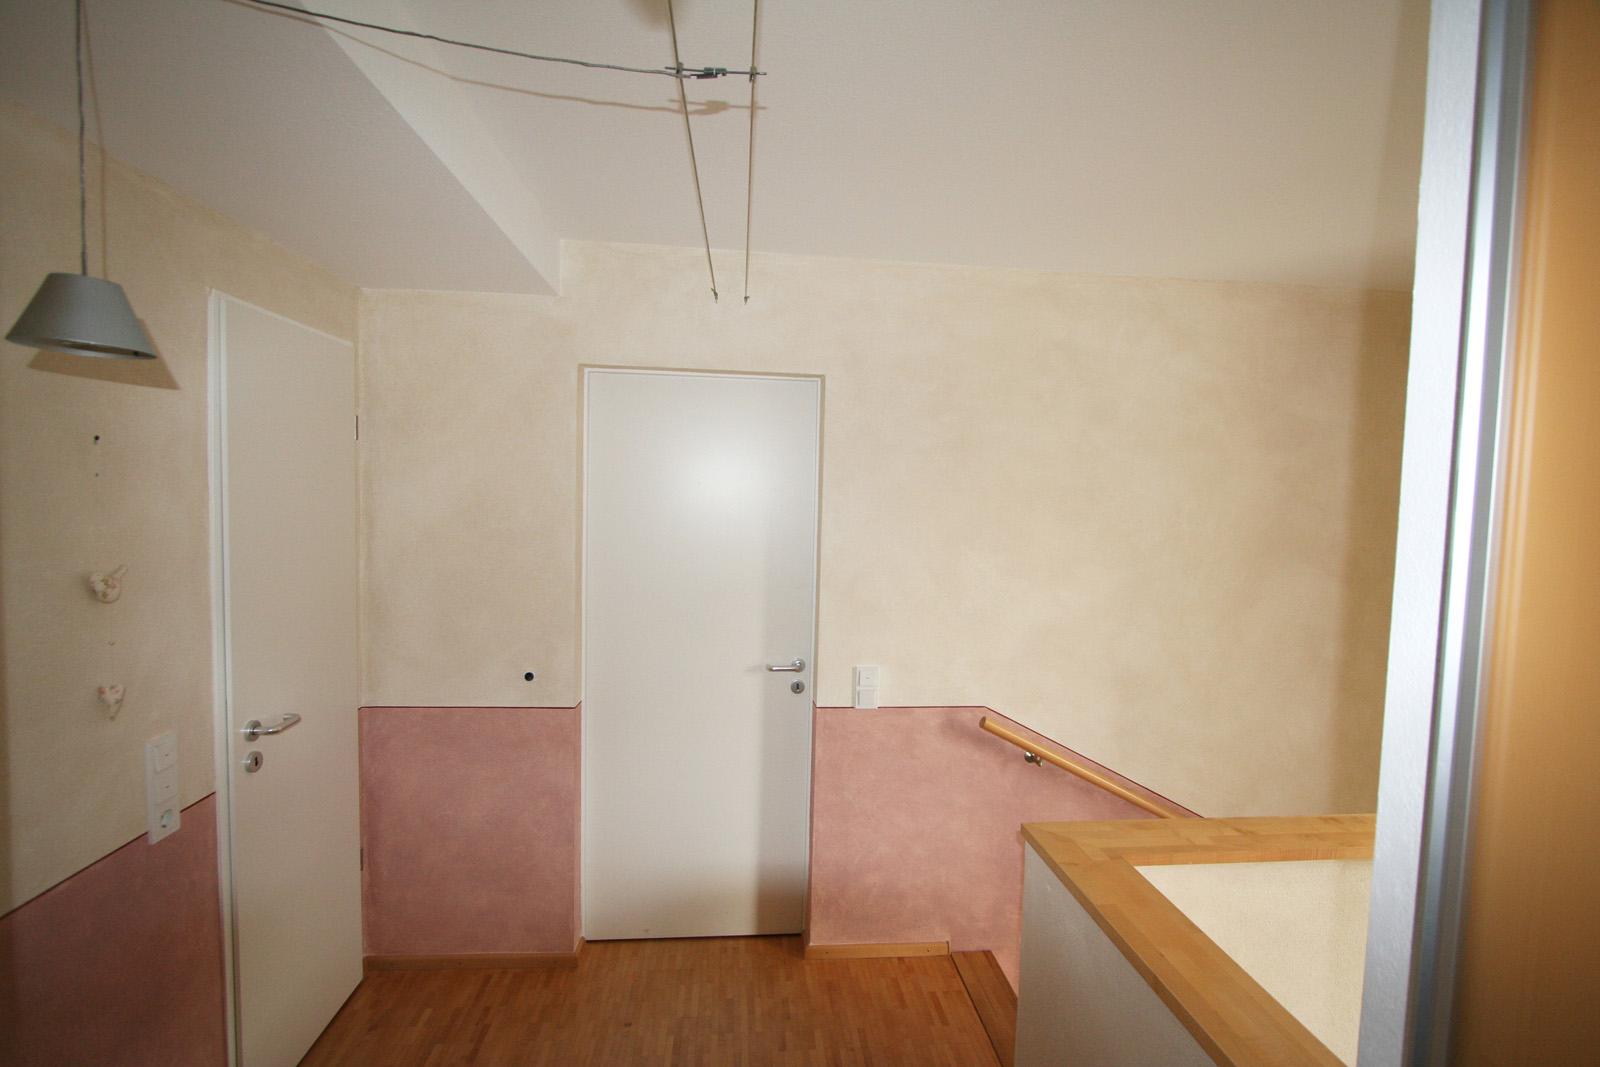 gestaltung treppenhaus gallery of wonderful dekoration. Black Bedroom Furniture Sets. Home Design Ideas